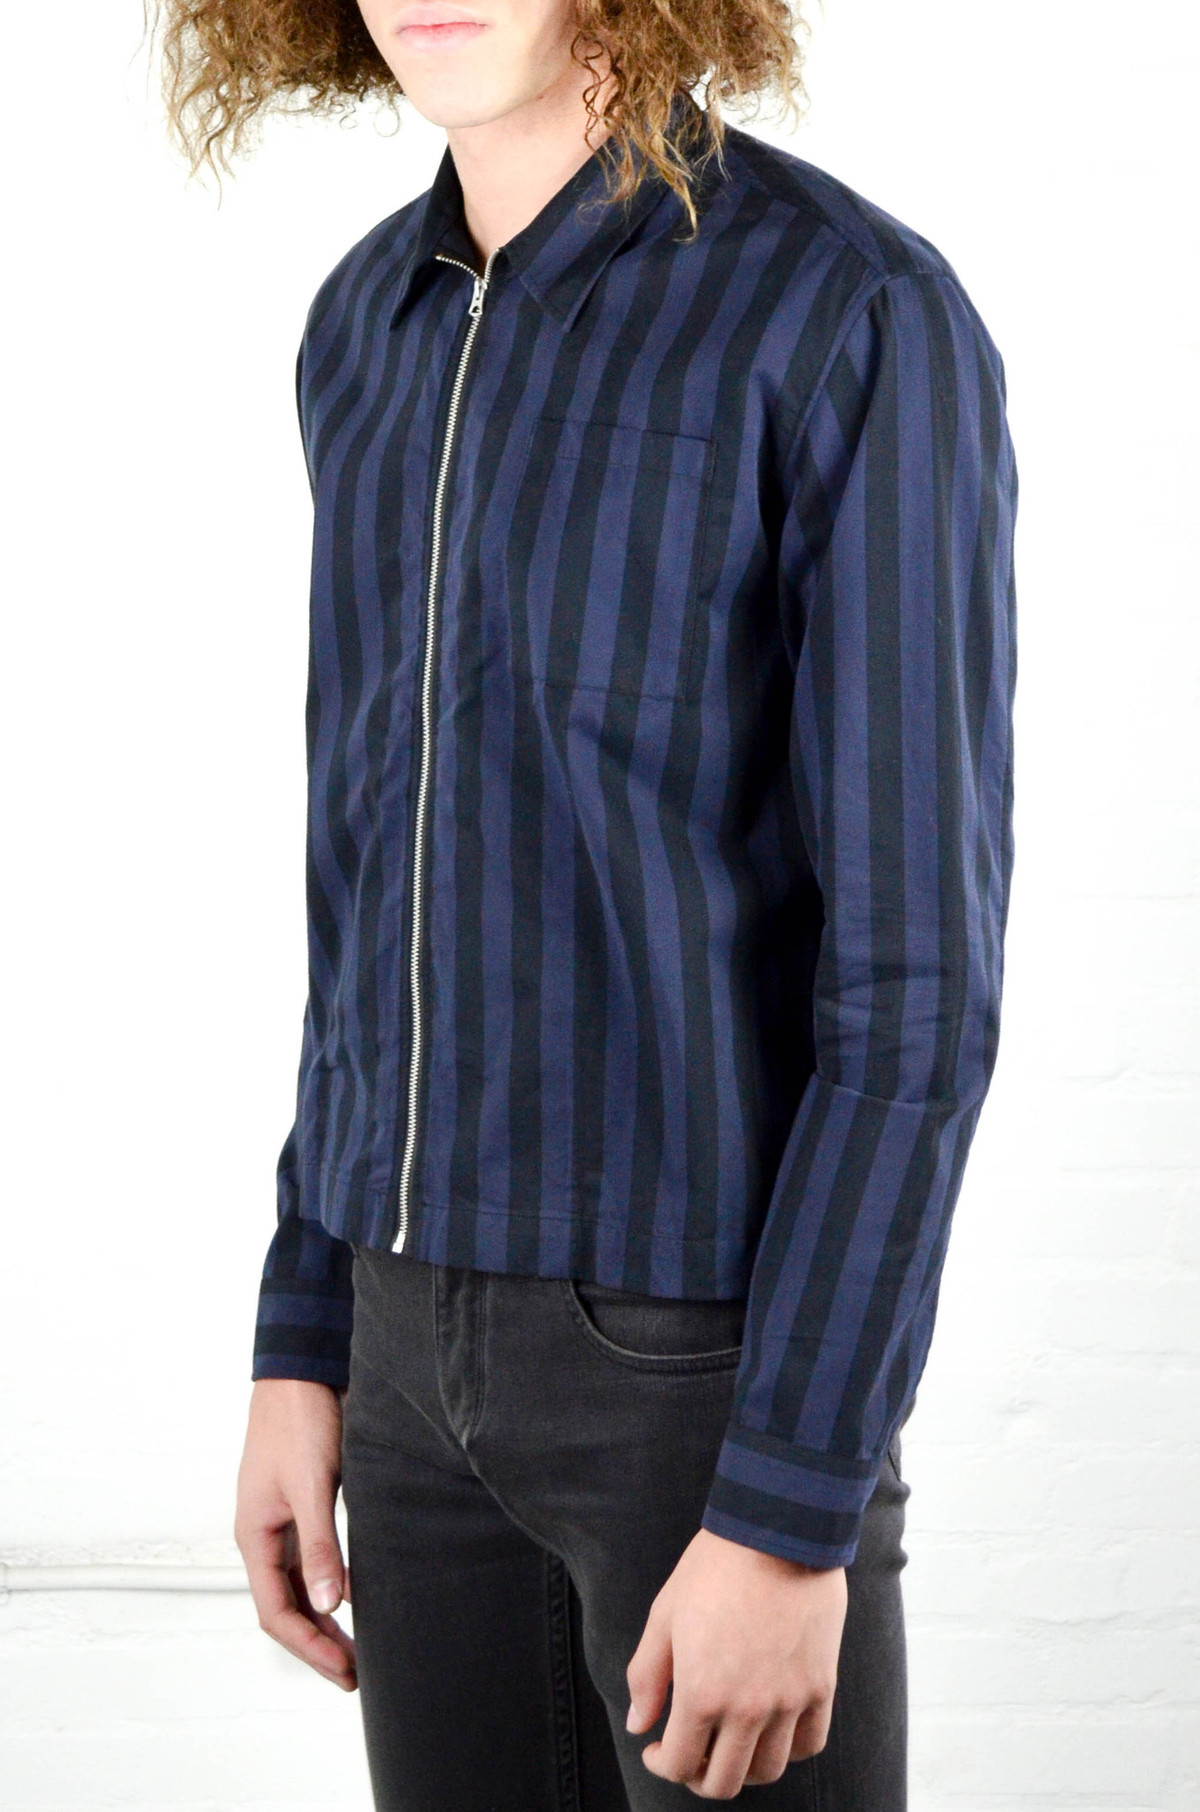 Ymc black t shirt - Size L